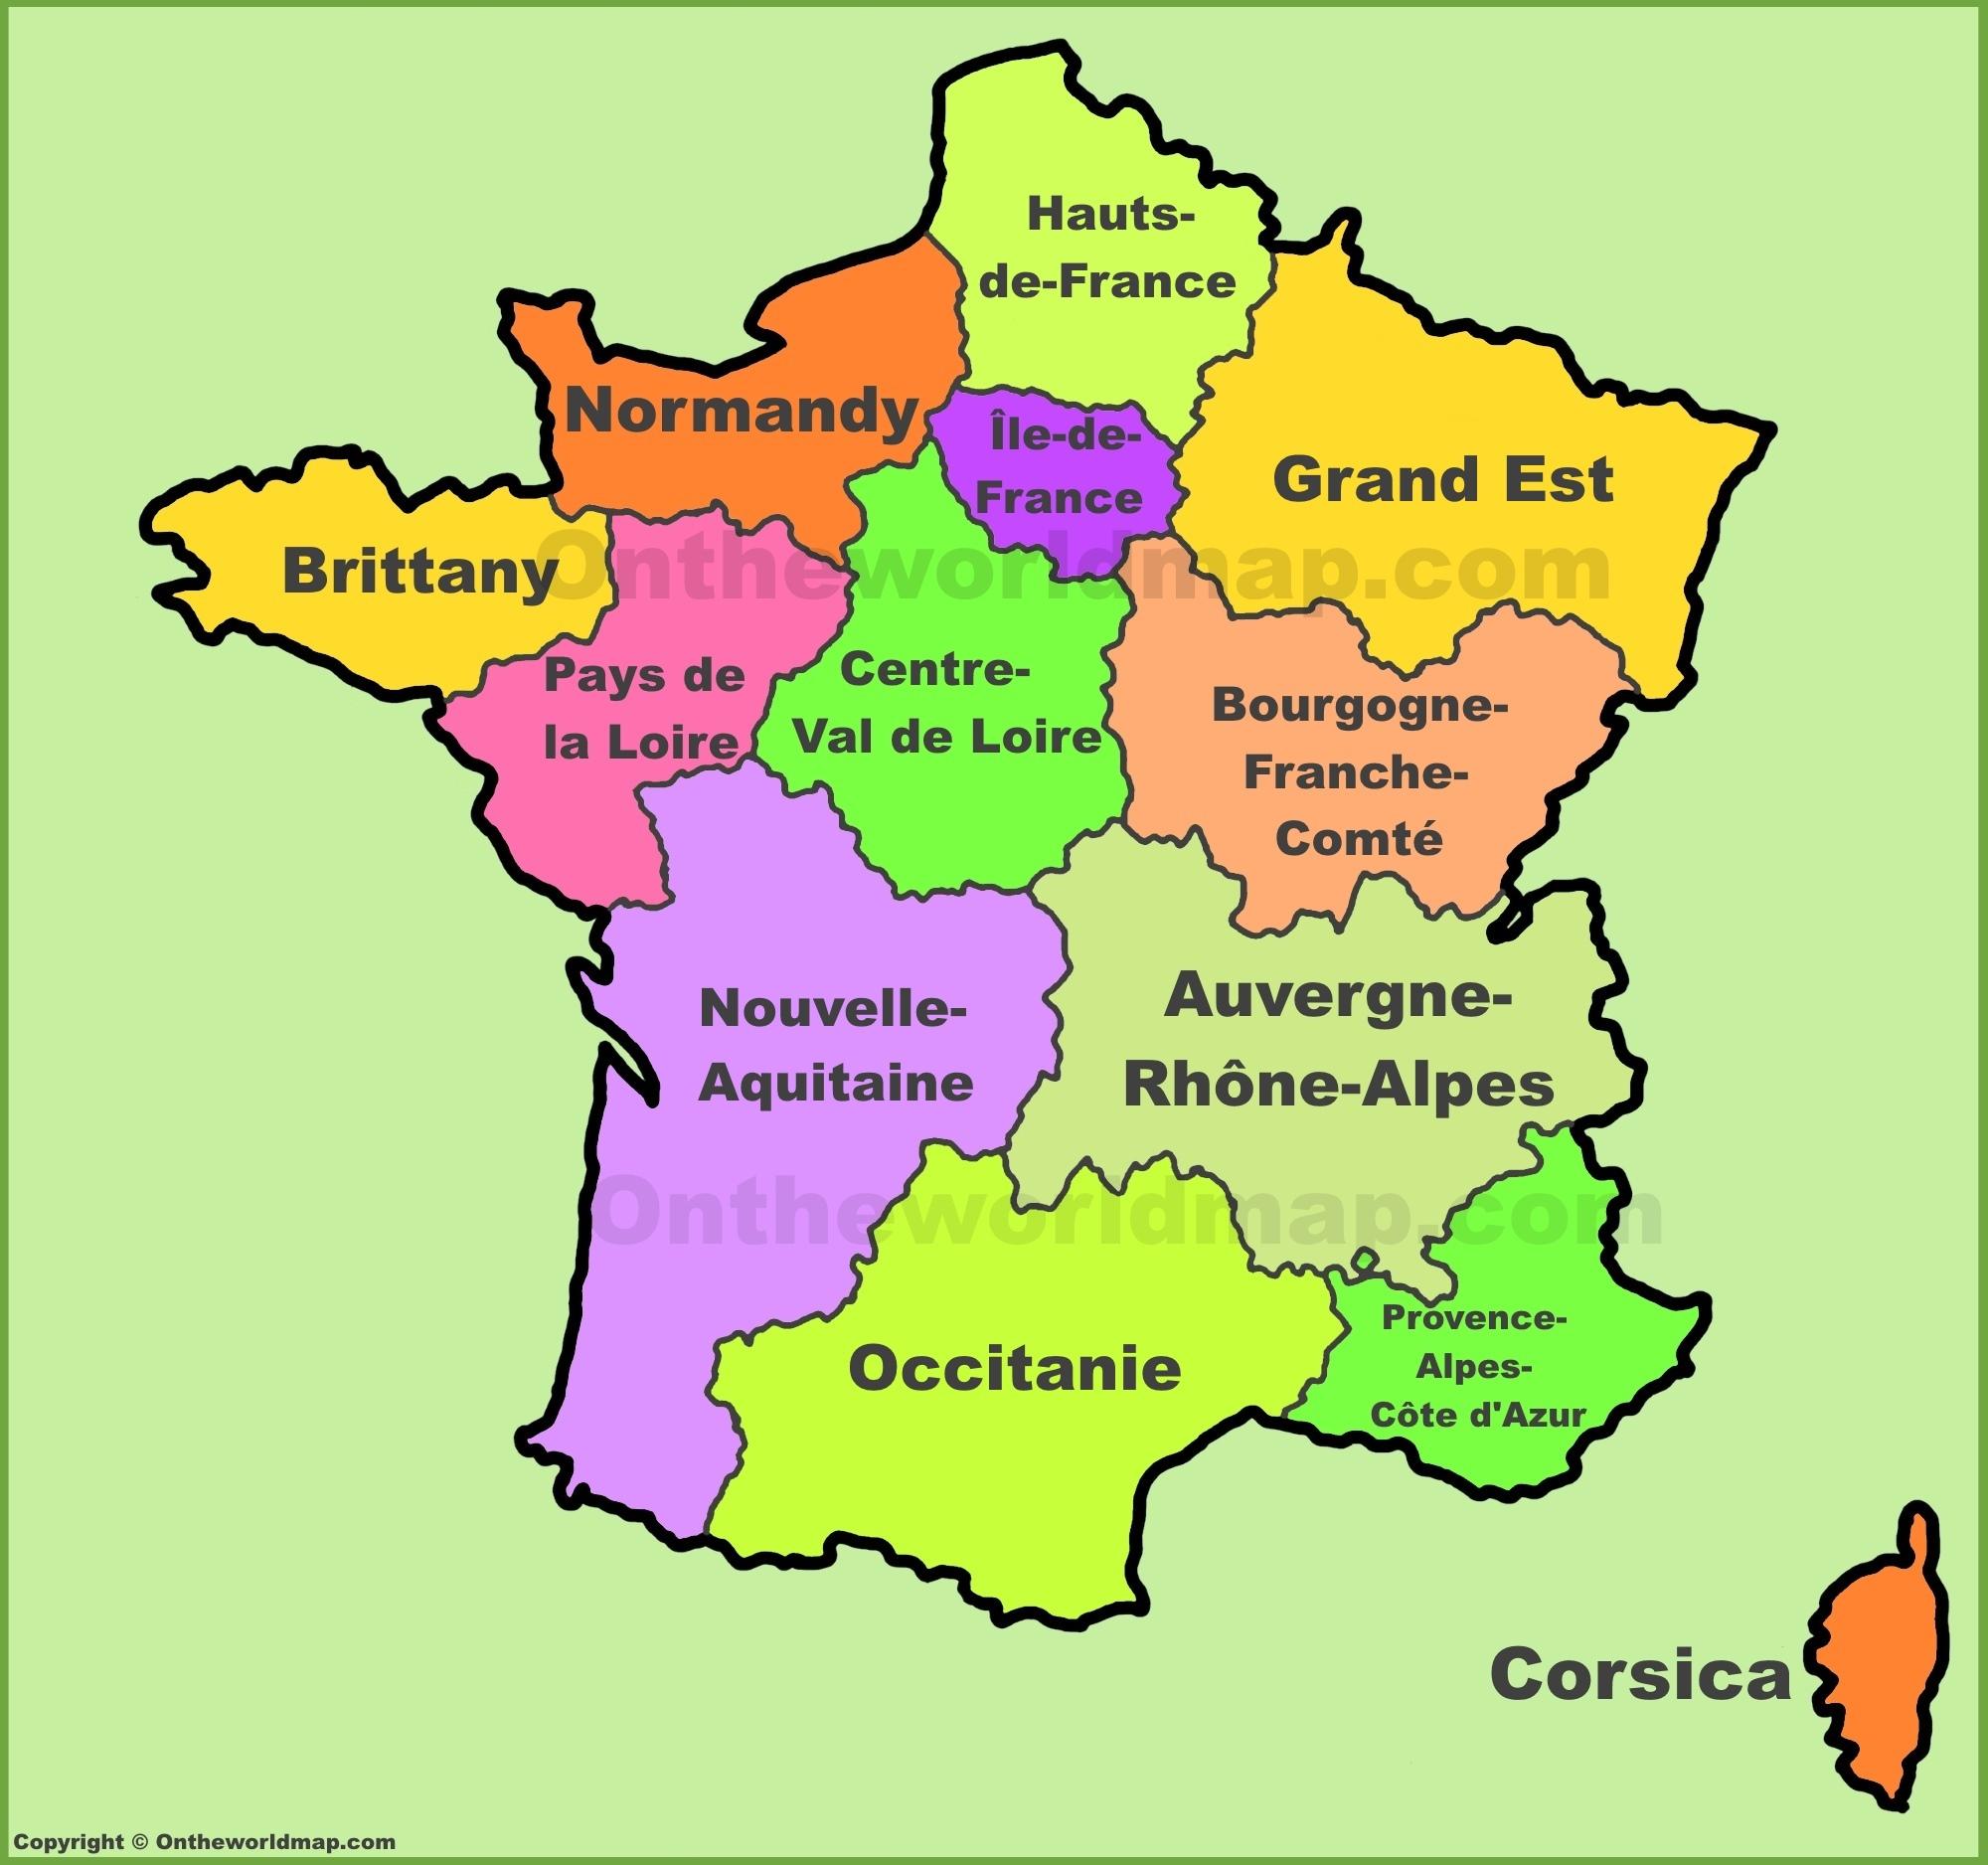 France Regions Map | New Regions Of France tout Map De France Regions